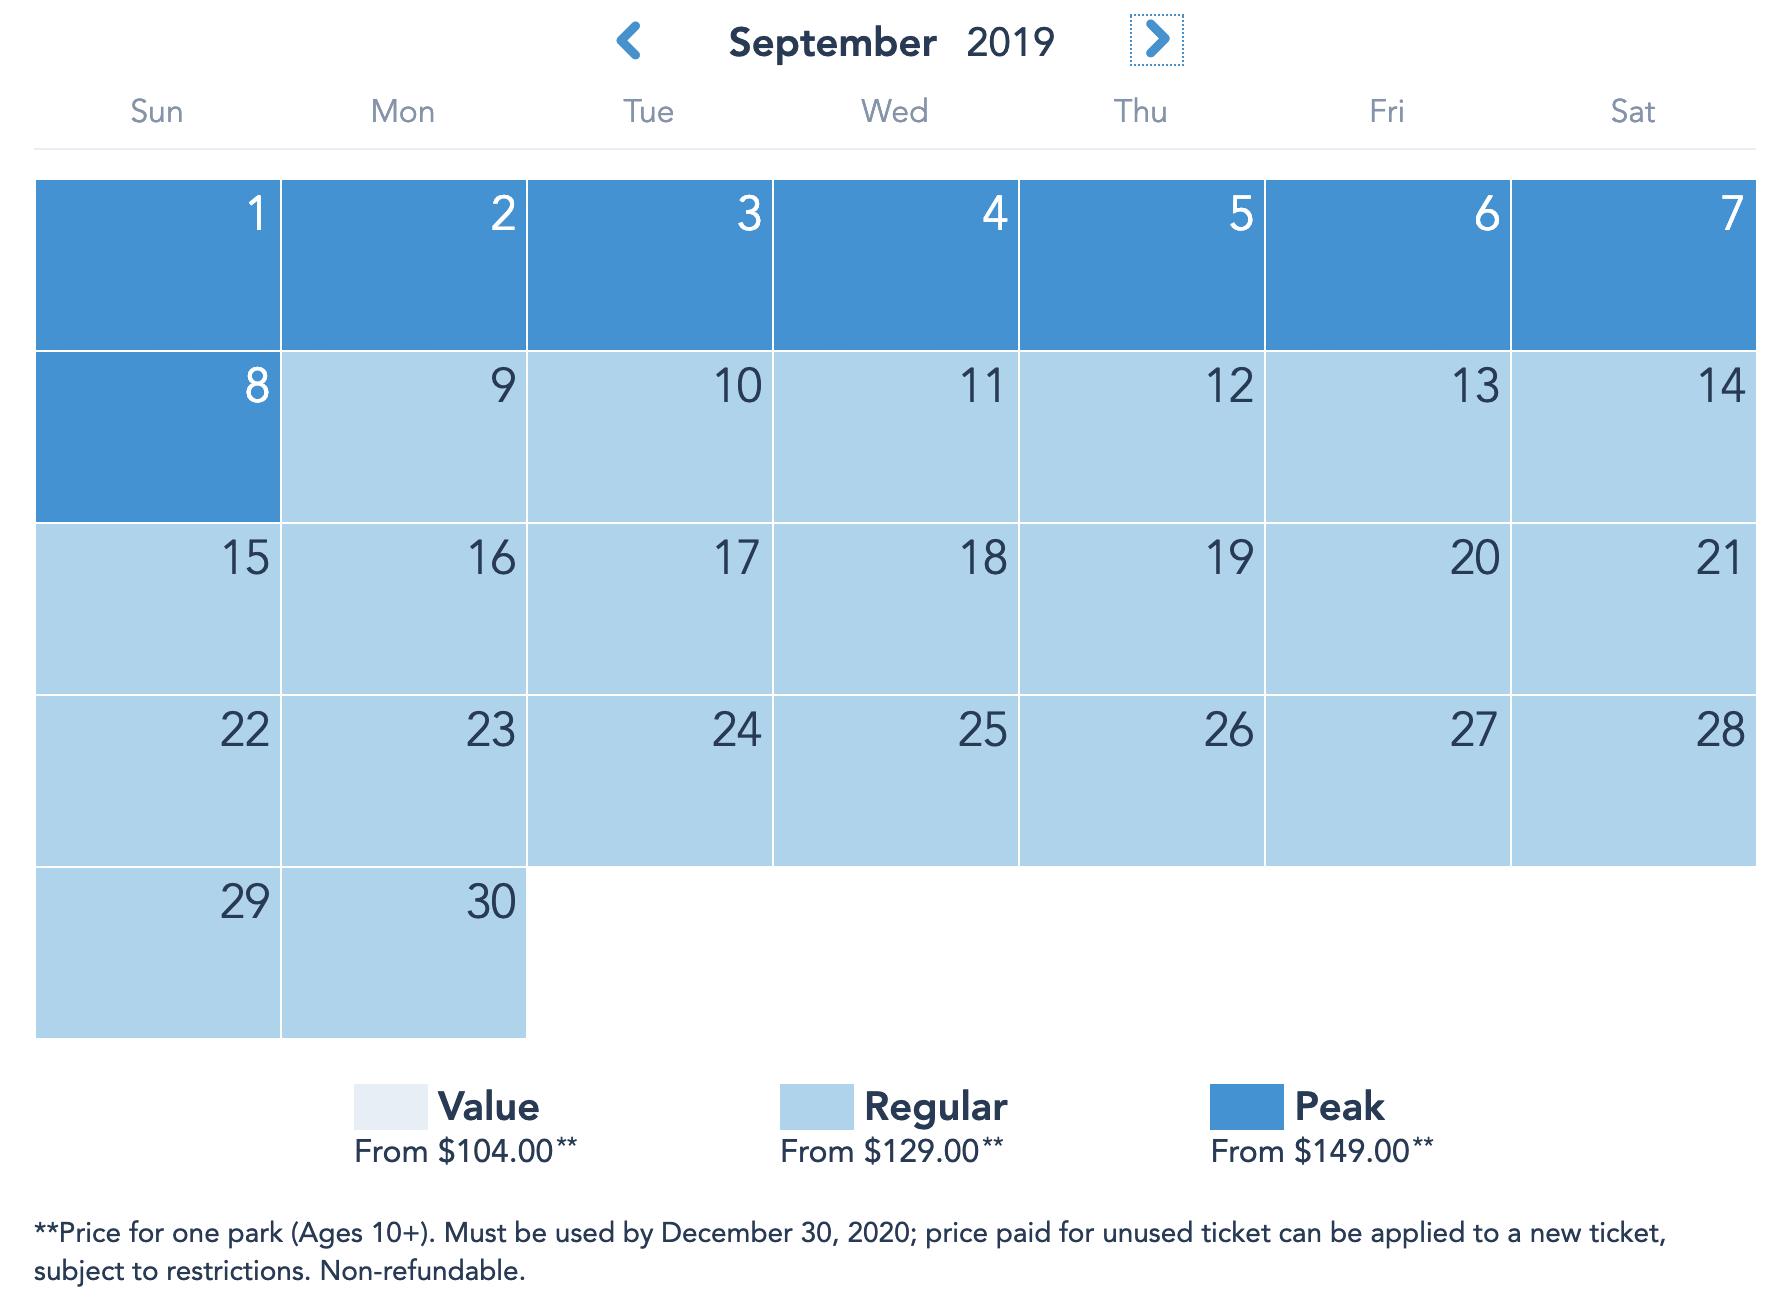 Disneyland Resort Prices - September